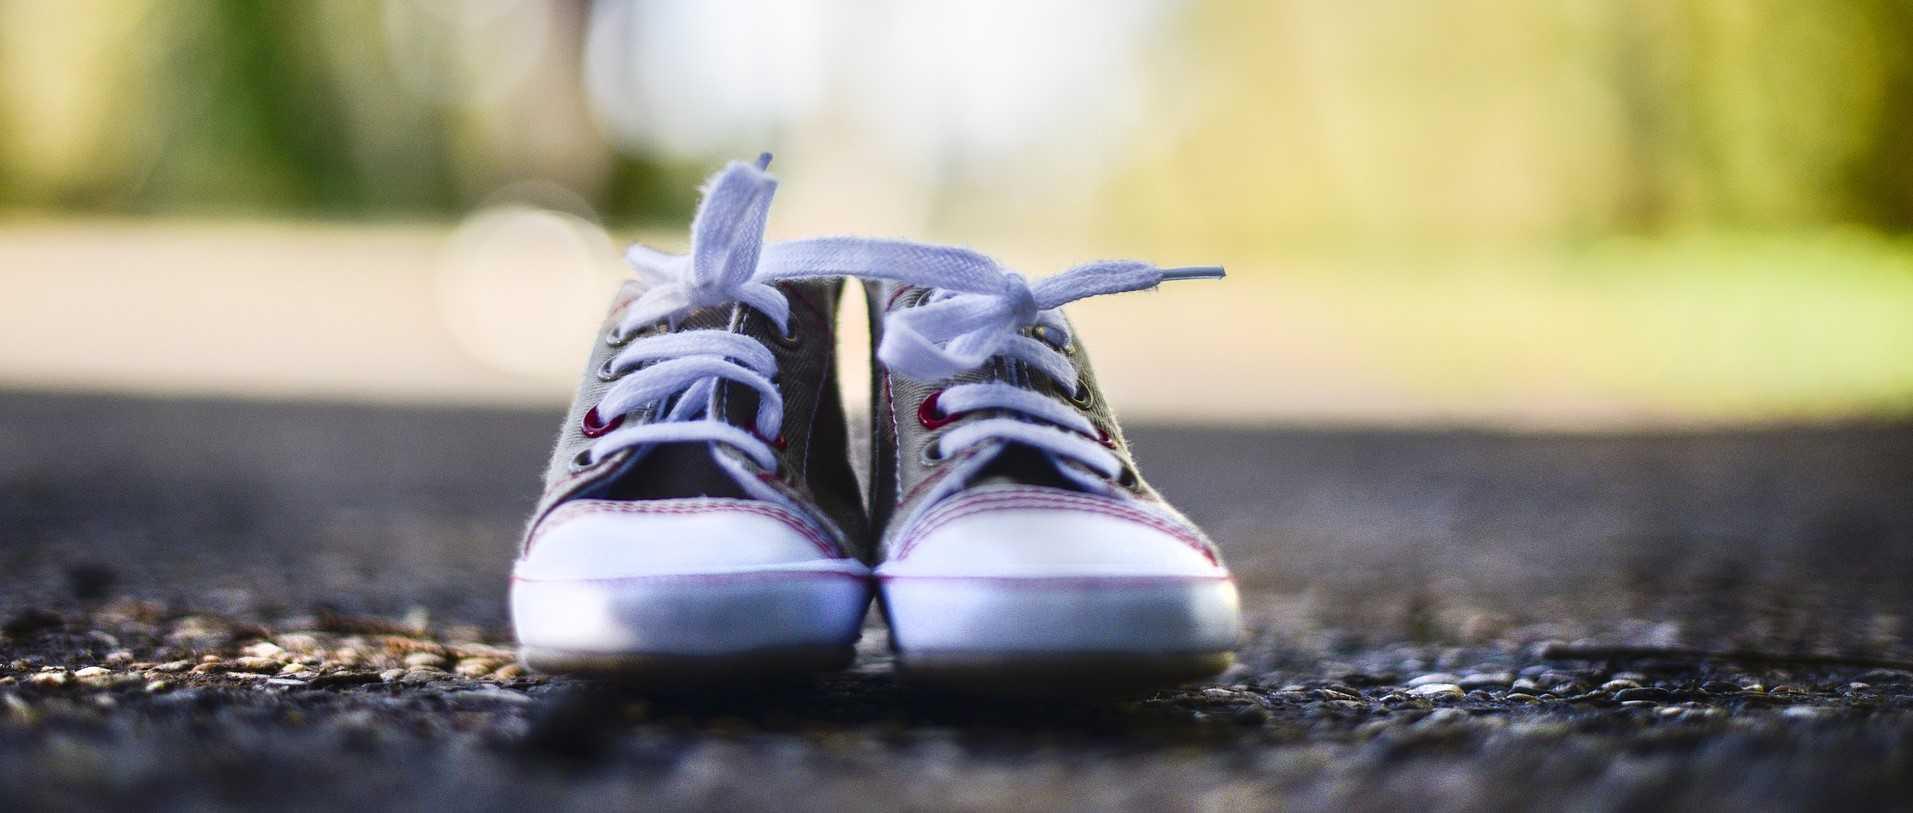 Kids Shoes | Kids Car Donations